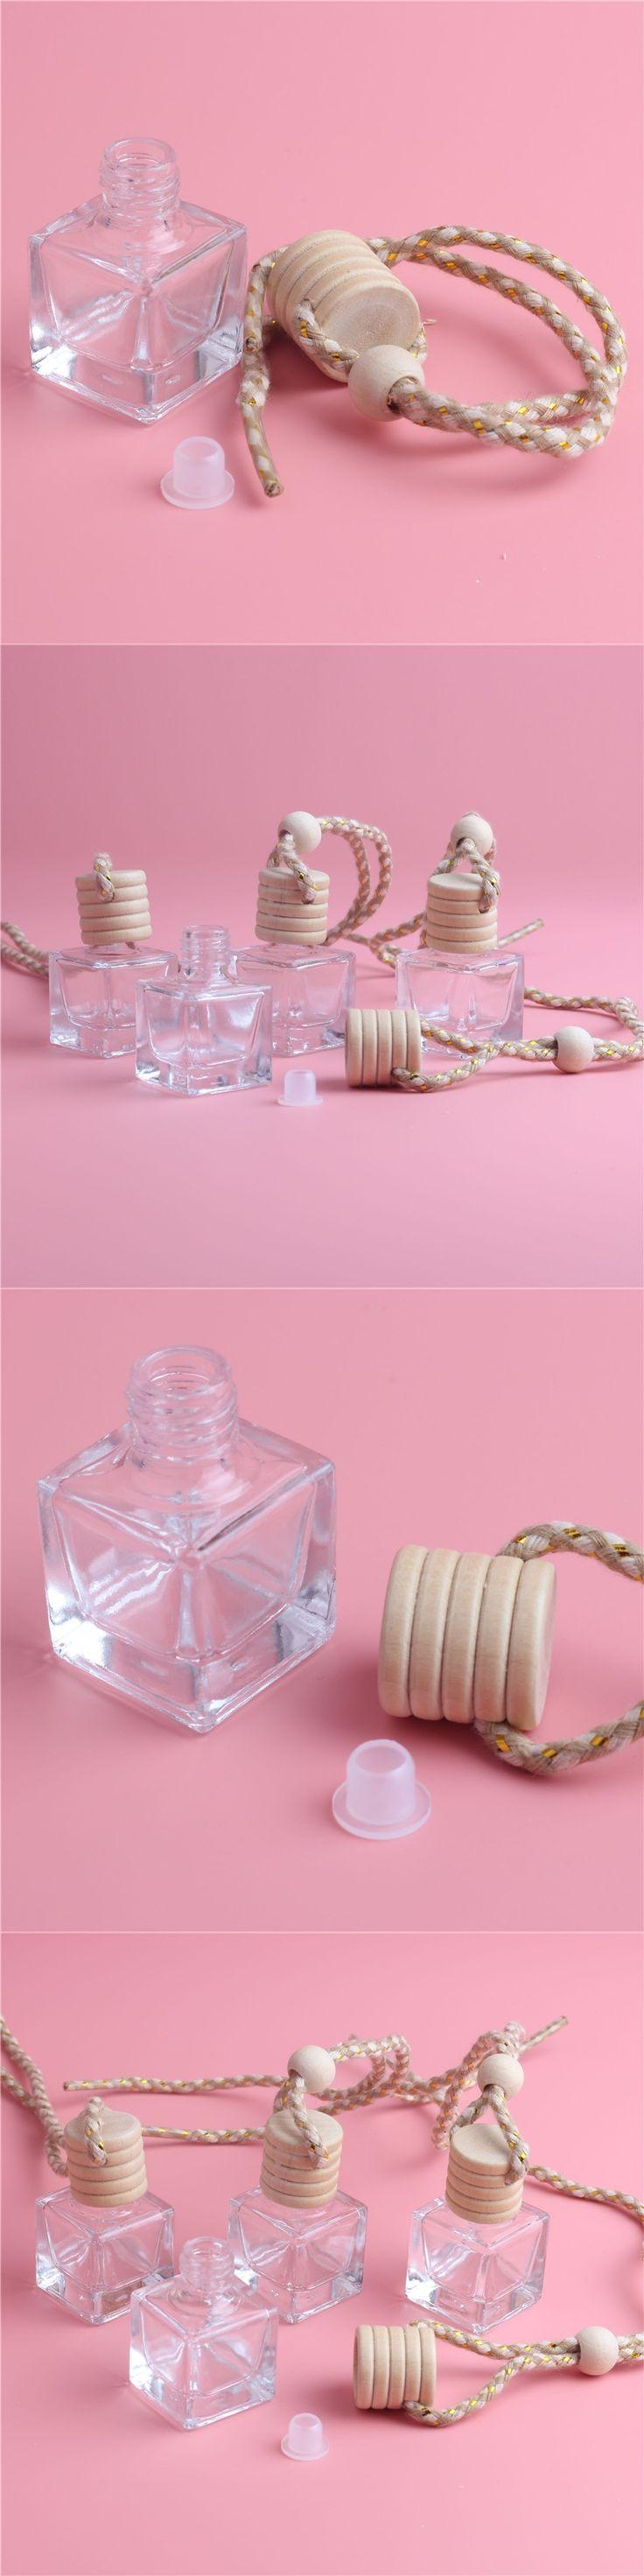 New Fashion 1PCS/LOT 6ML Mini Diamond Hanging Car Perfume Bottles Steam Car Accessories Bottle Empty Bottle